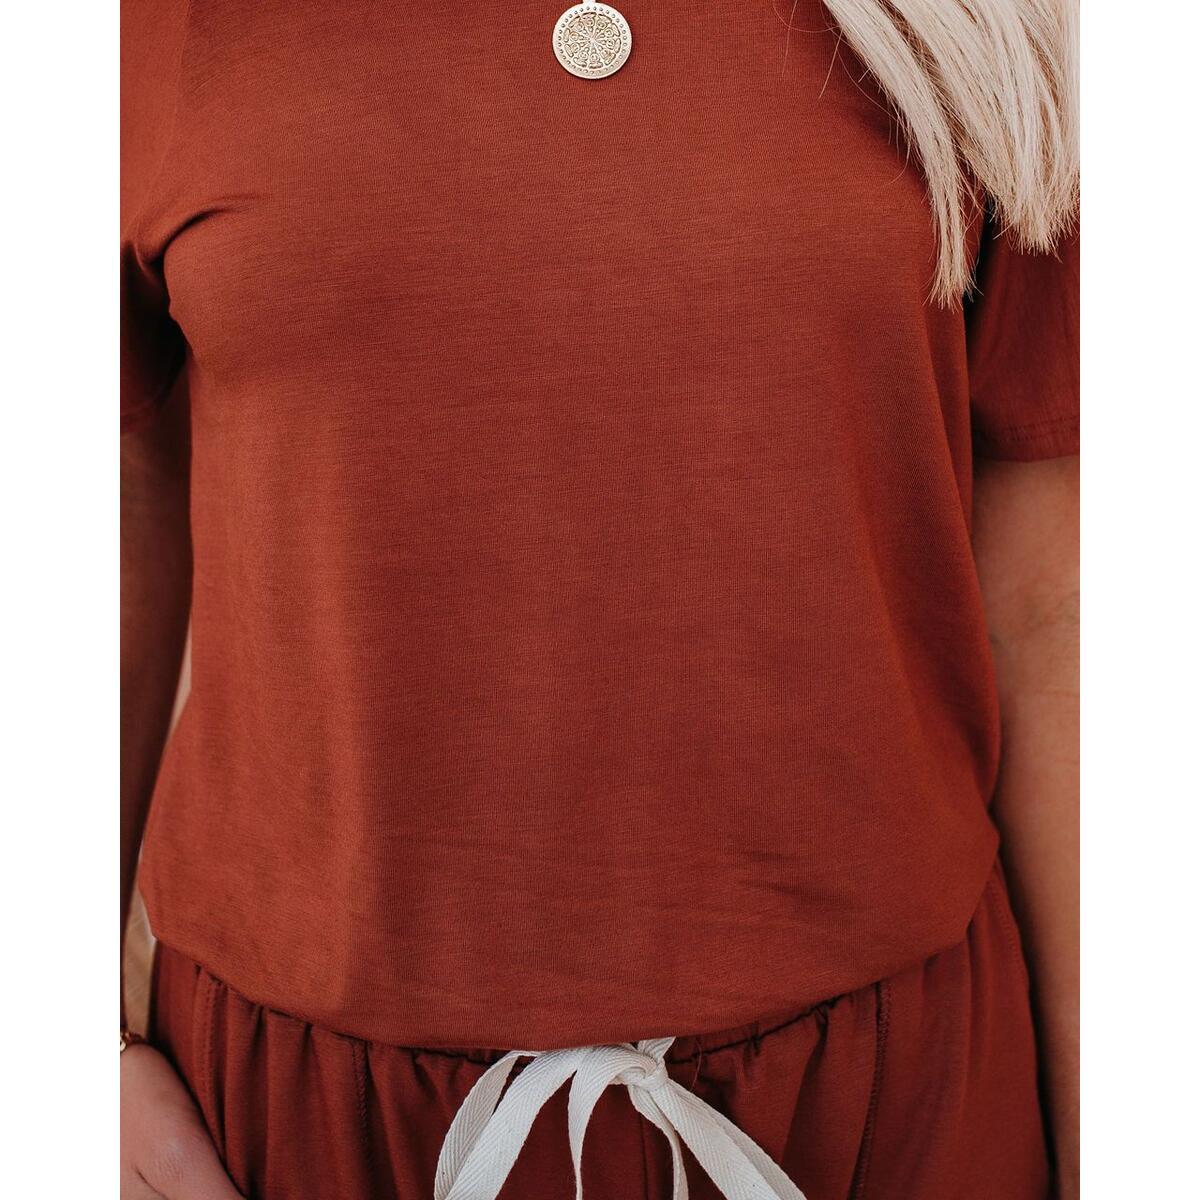 Women's Loose Fit Off Shoulder Elastic Waist Beam Foot Jumpsuit Rompers with Pockets Orange